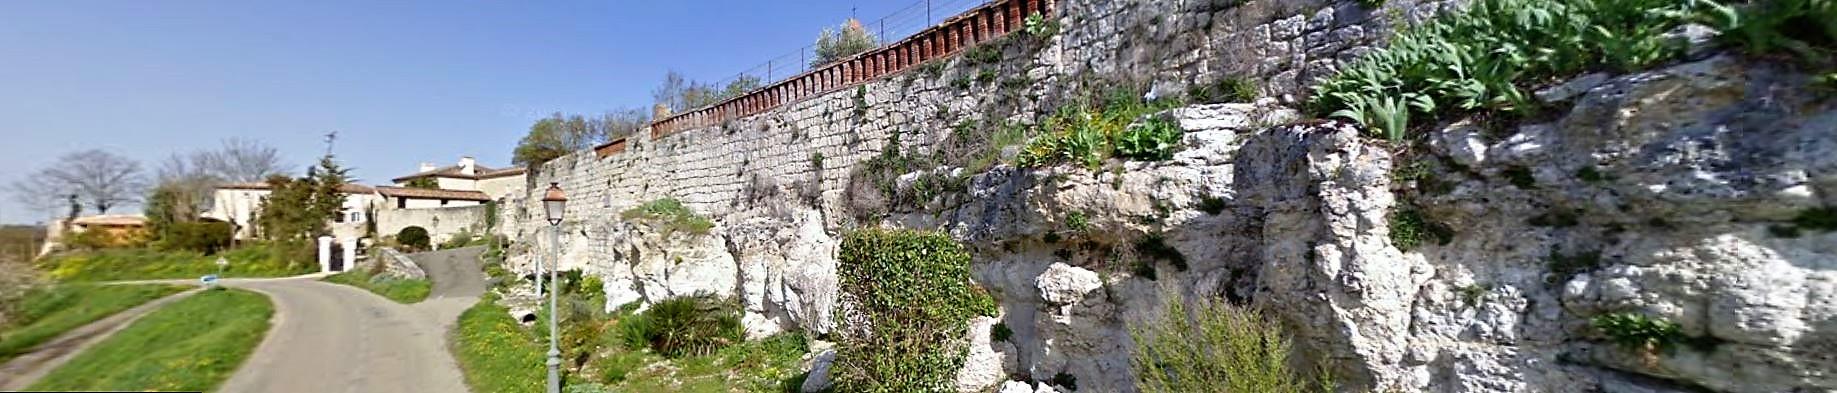 Maubec Remparts